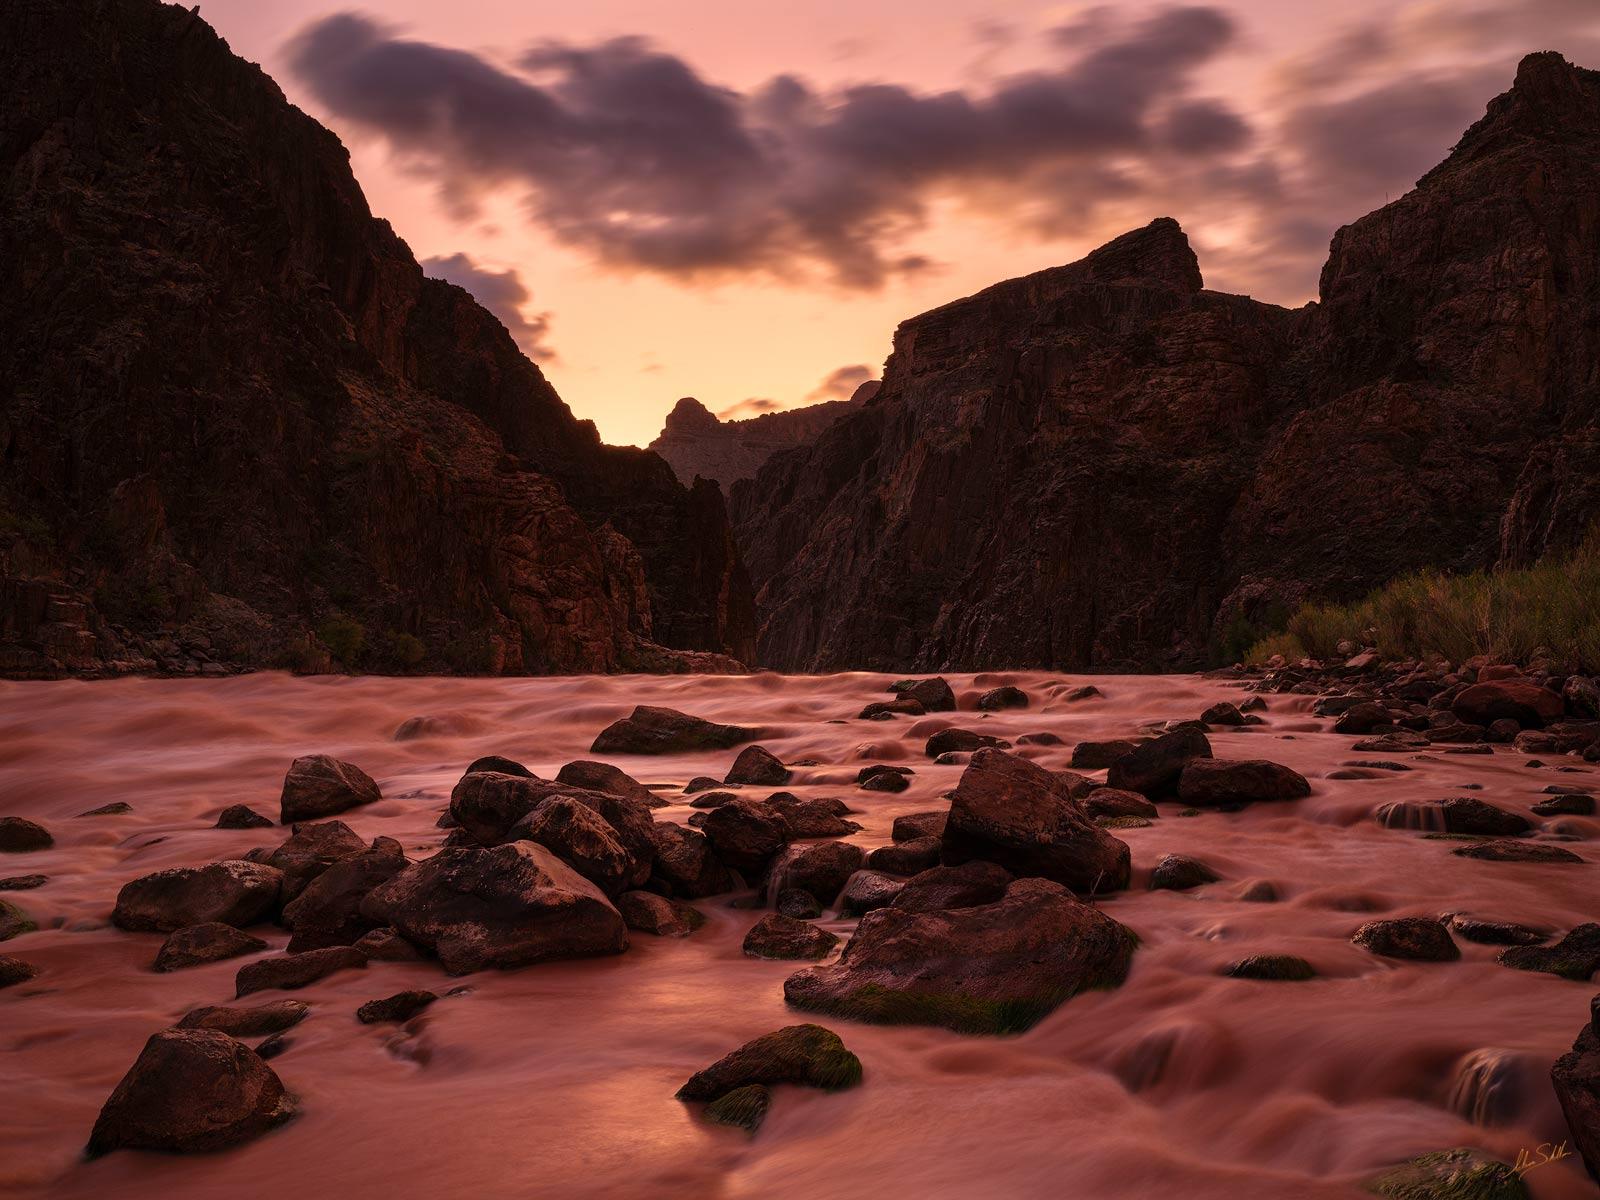 Arizona, AZ, Expedition, FujiFilm, GFX, GFX 100, Grand Canyon, Granite Rapid, National Park, River Trip, Sunrise, photo